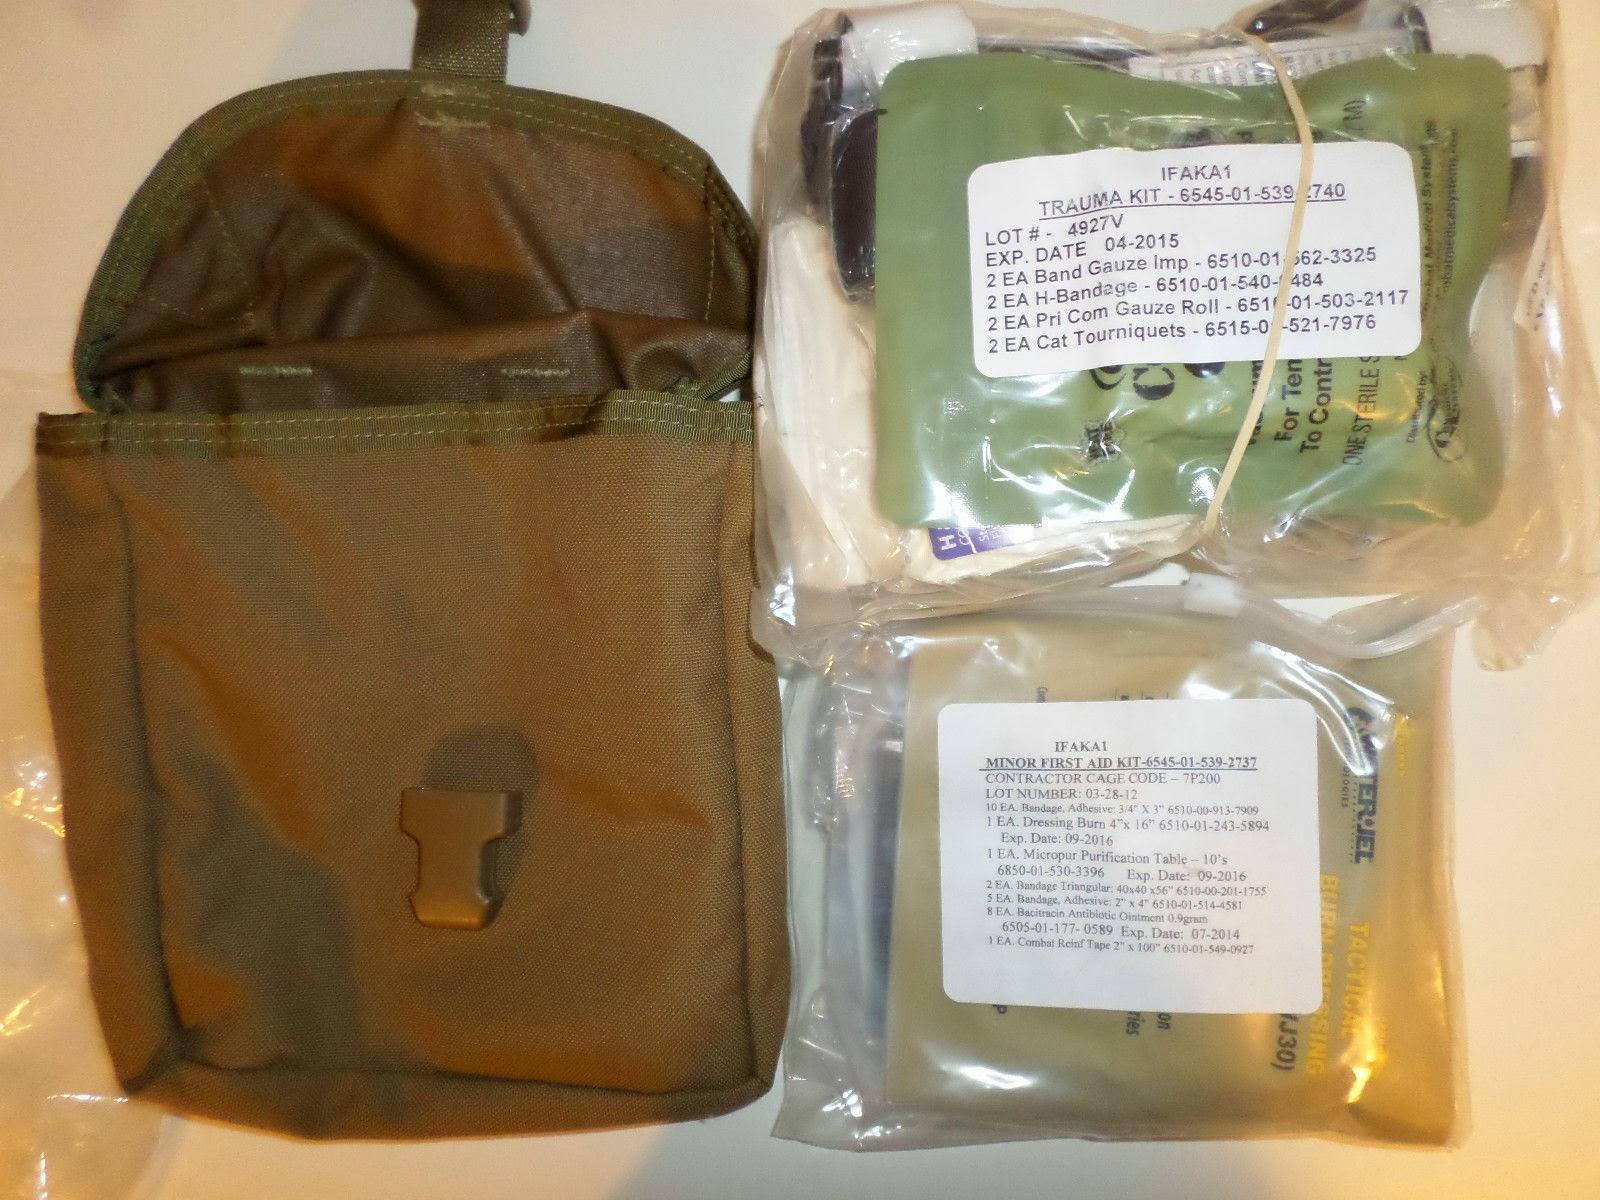 Webbingbabel: USMC First Aid Kit IFAK A1 2006